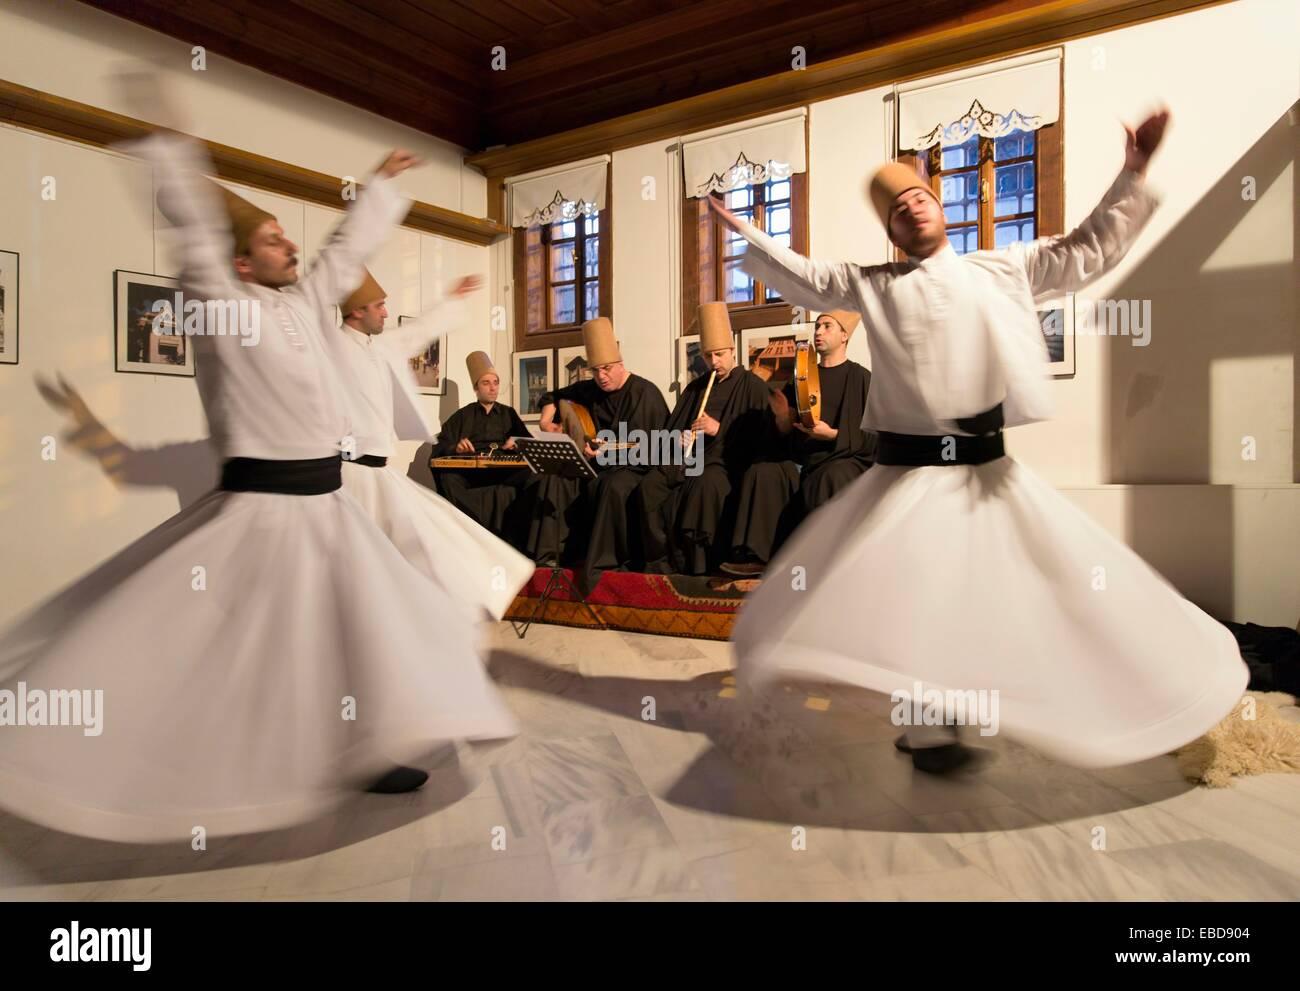 Whirling mystic dervishes perform at Dede Efendi House. Istanbul Turkey. - Stock Image